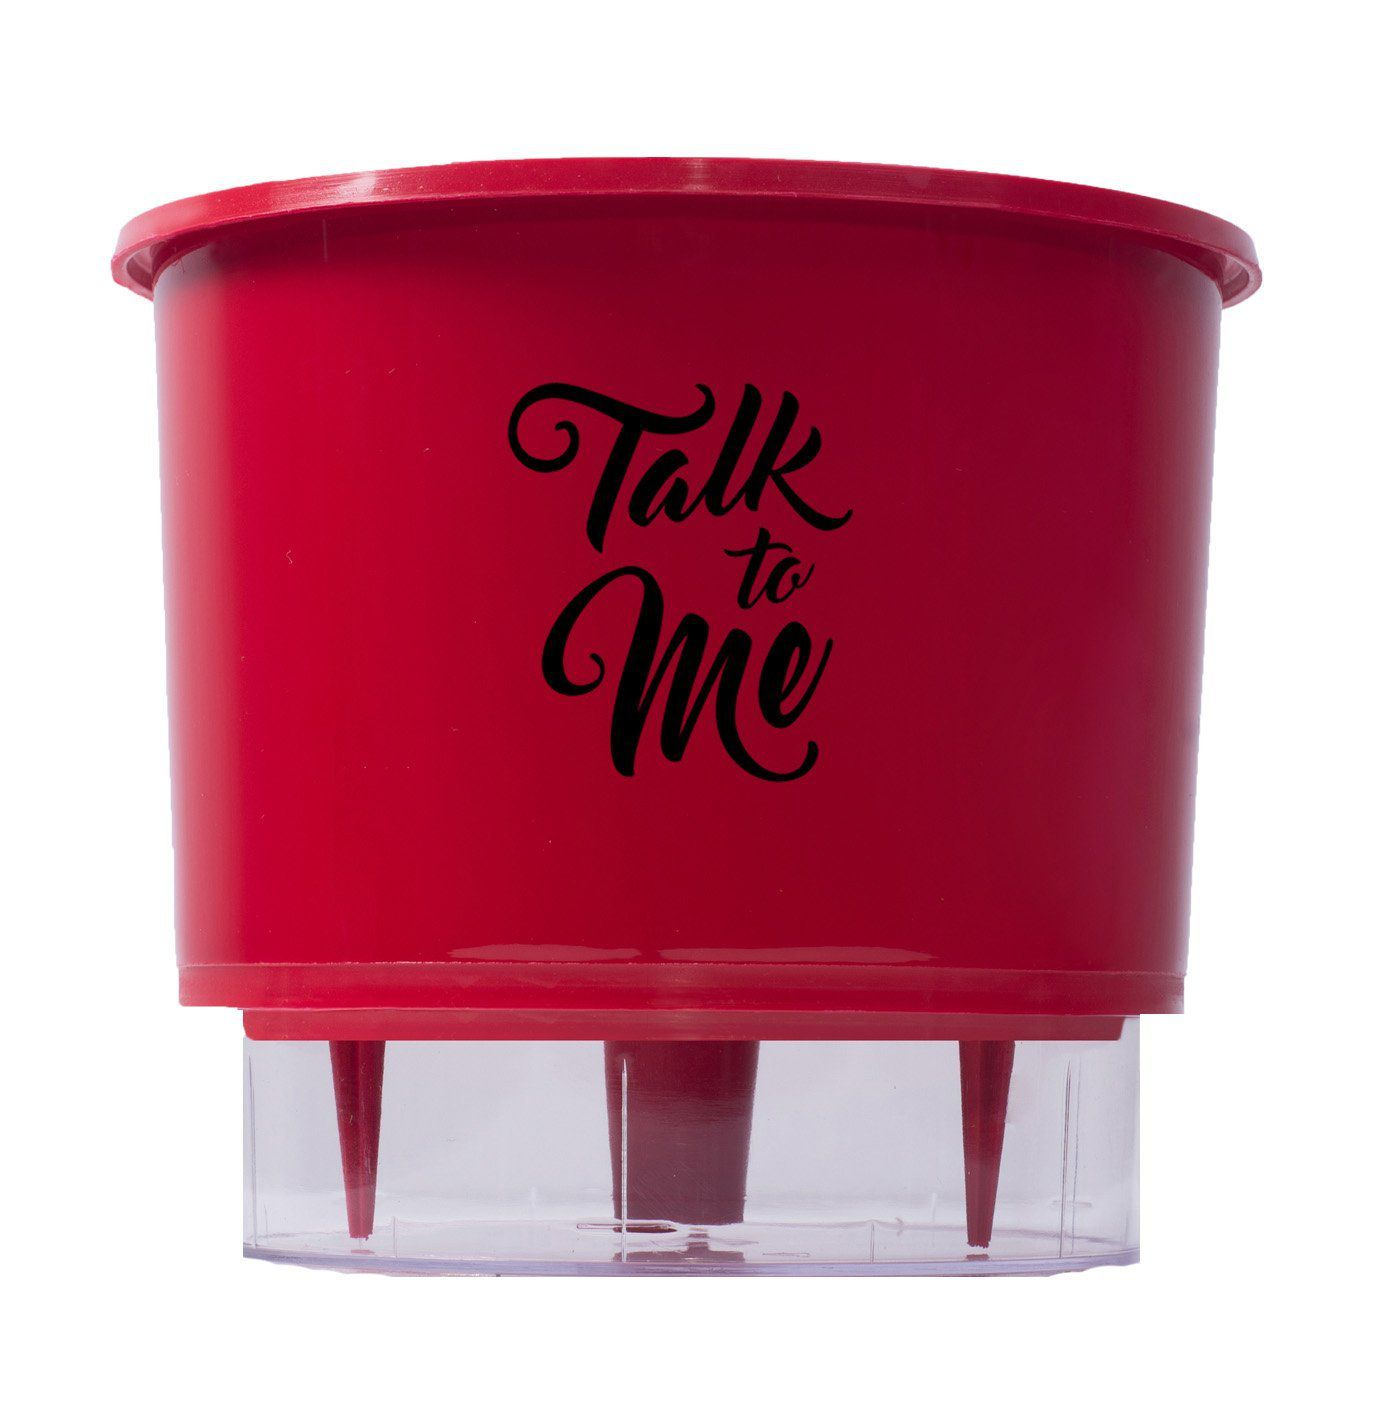 Vaso Autoirrigável Médio N03 Raiz Vermelho Linha Frases 16cm x 14cm Talk To Me